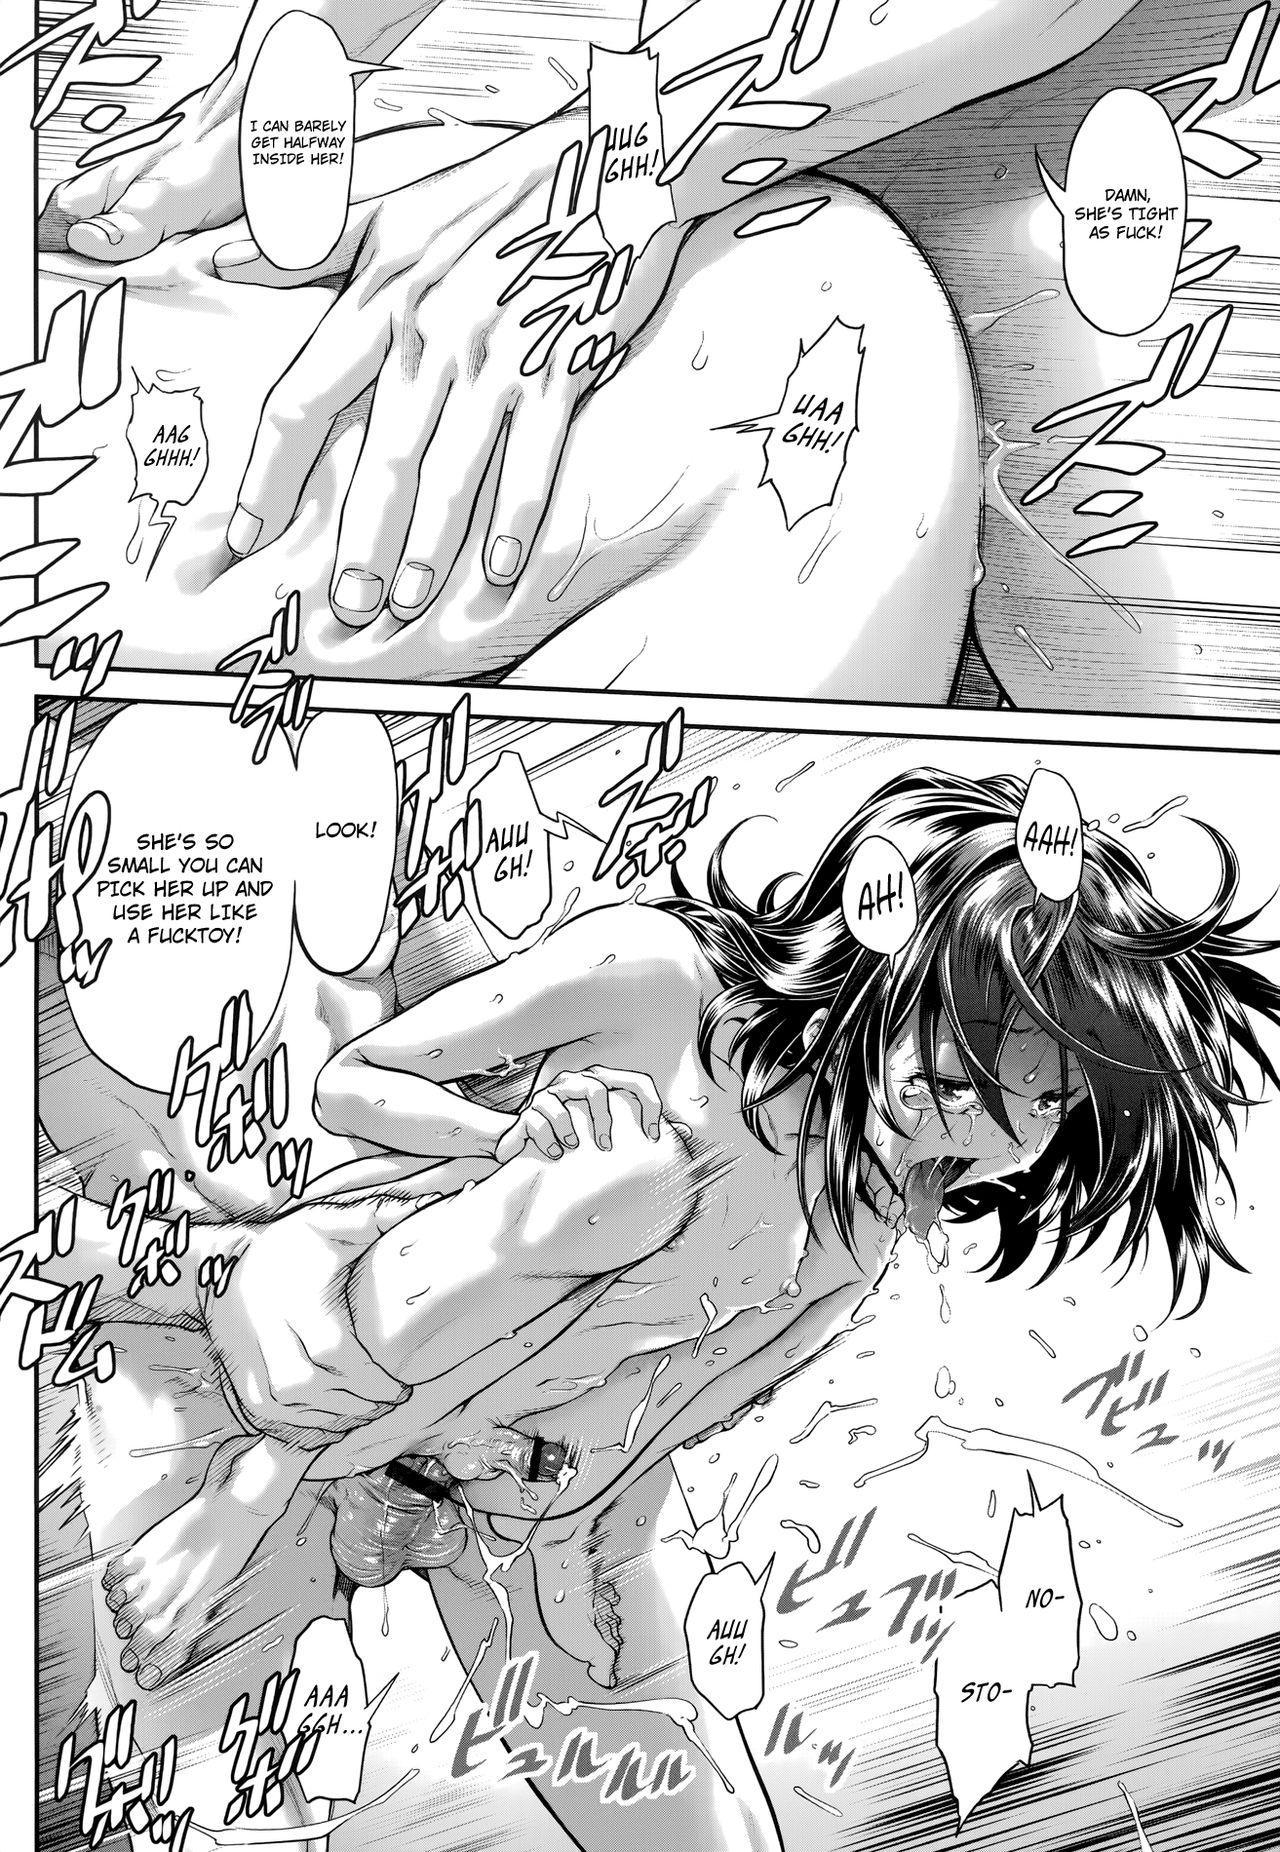 [Sannyuutei Shinta] Chinpotsuki Ijimerarekko | «Dickgirl!», The Bullying Story - Ch. 1-4 [English] [34th squad] 85